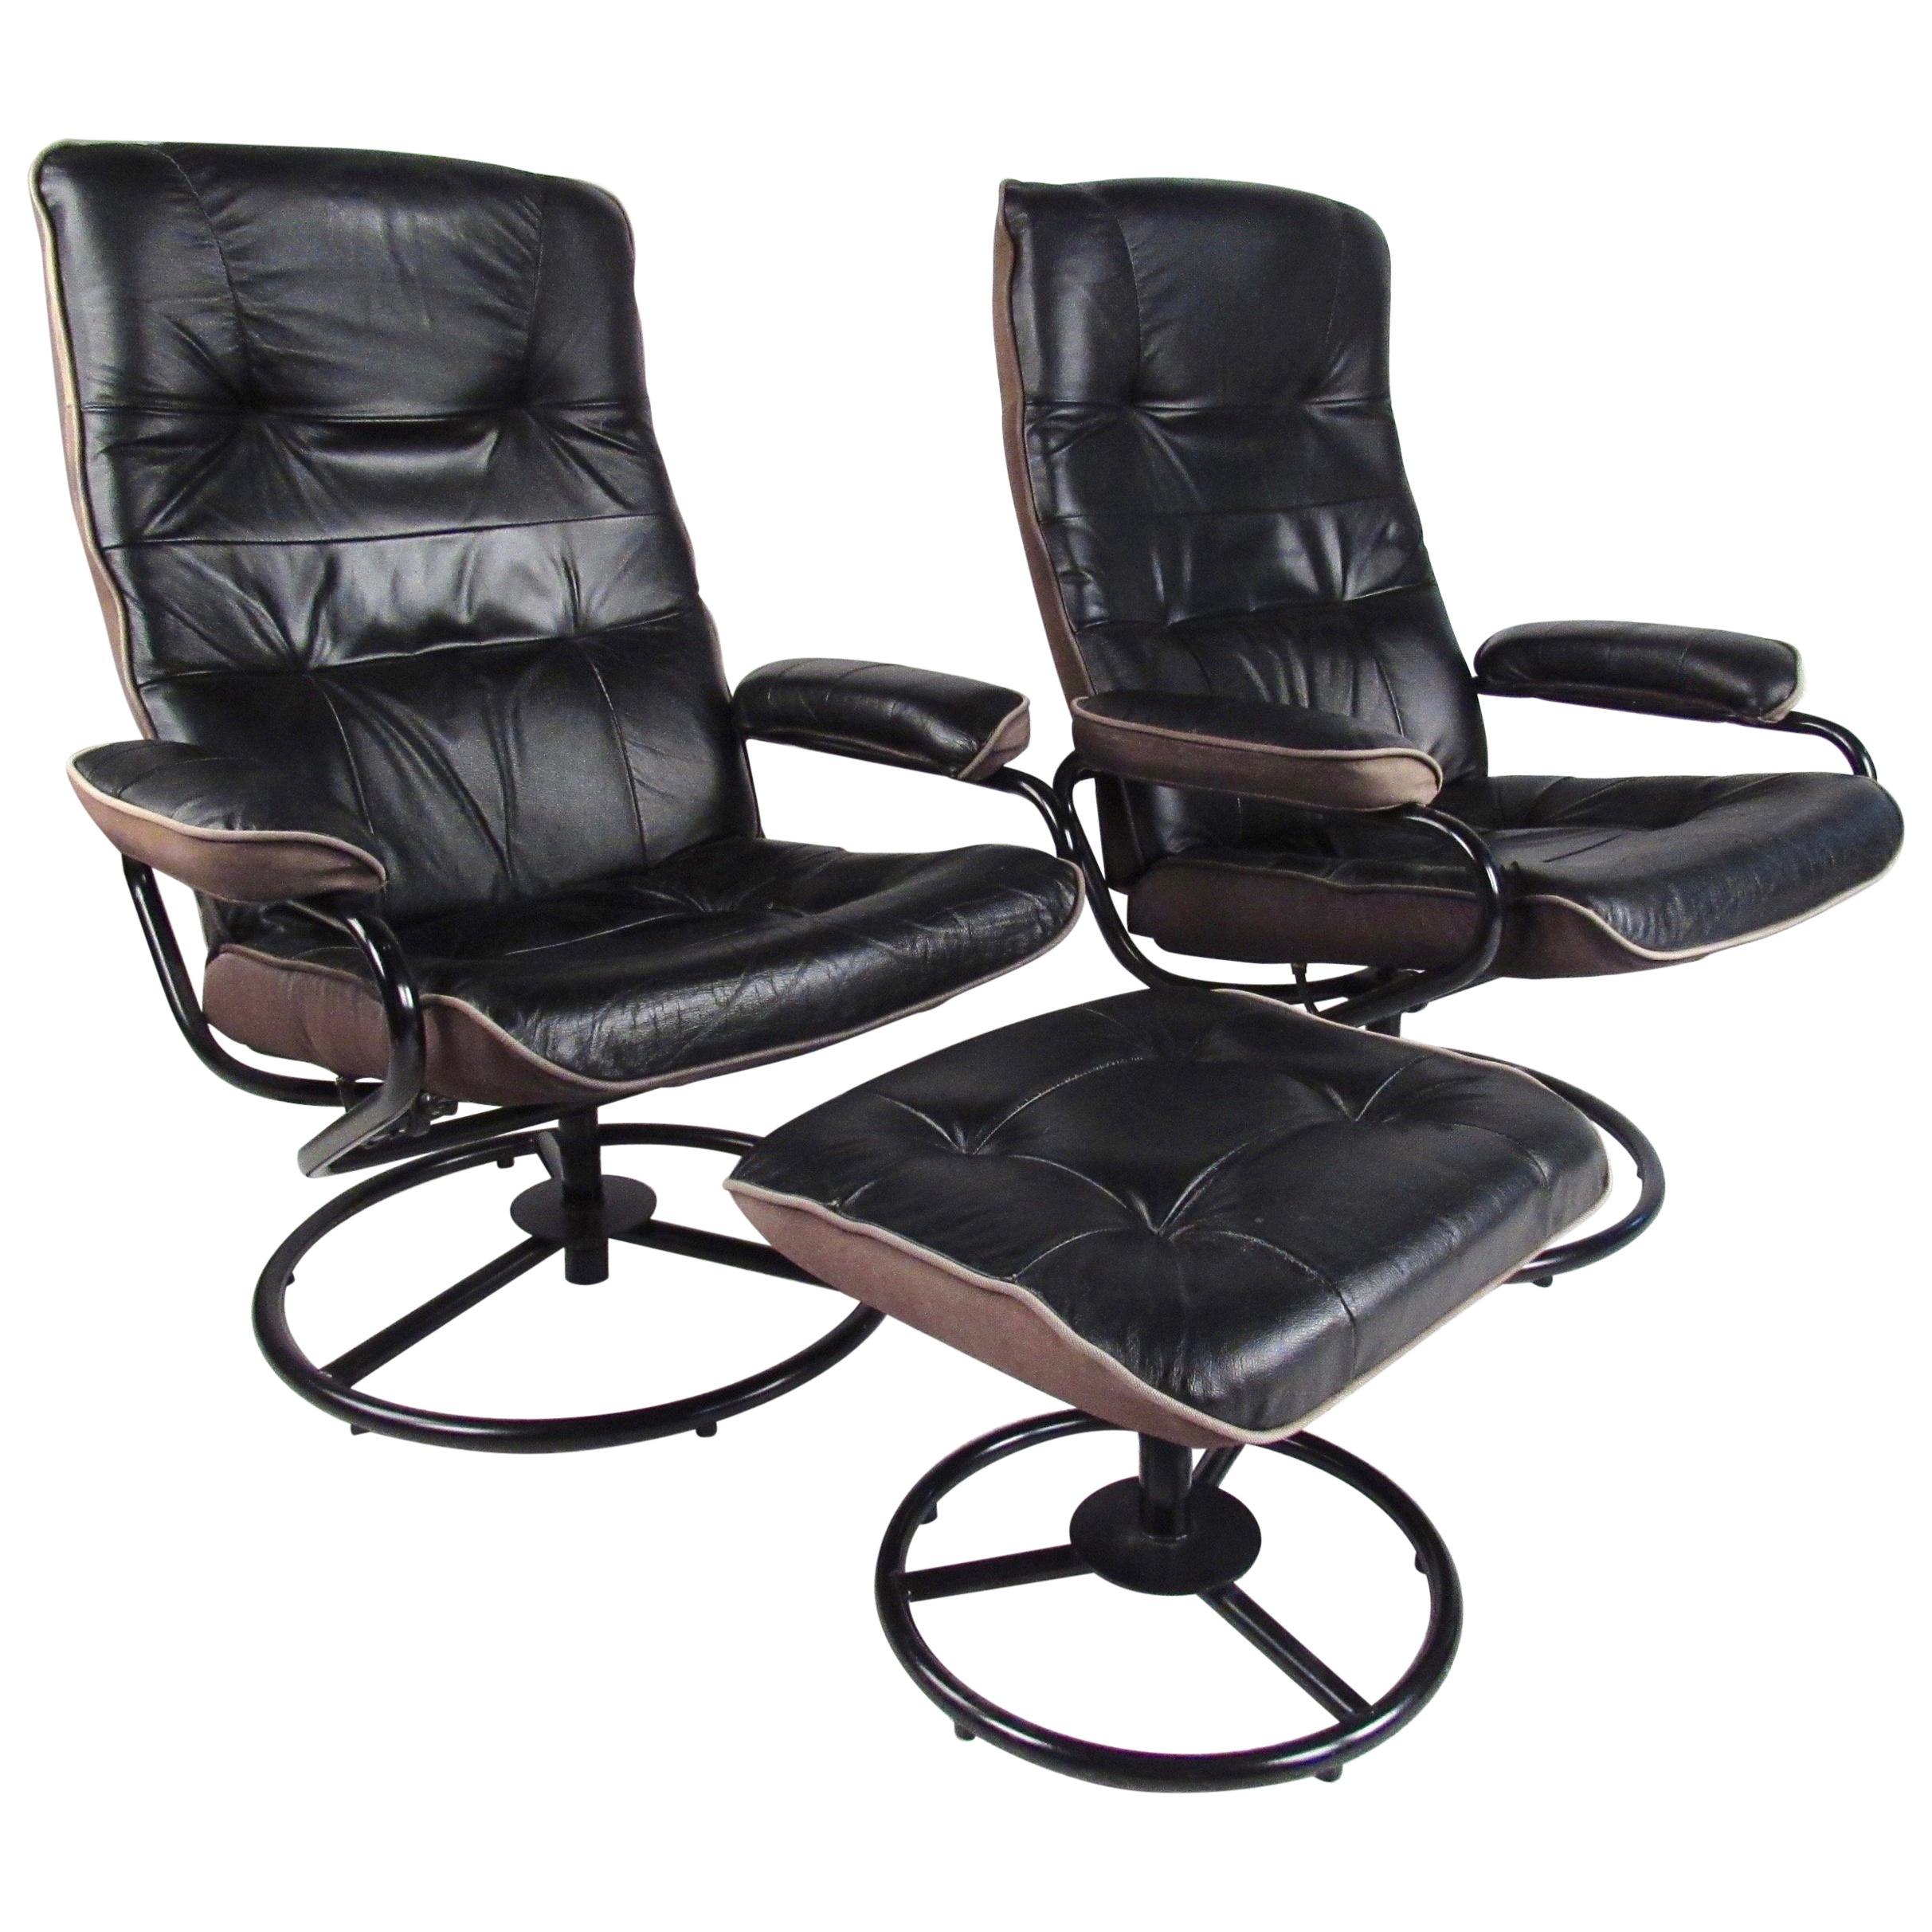 Pair of Scandinavian Modern Reclining Lounge Chairs with Ottoman